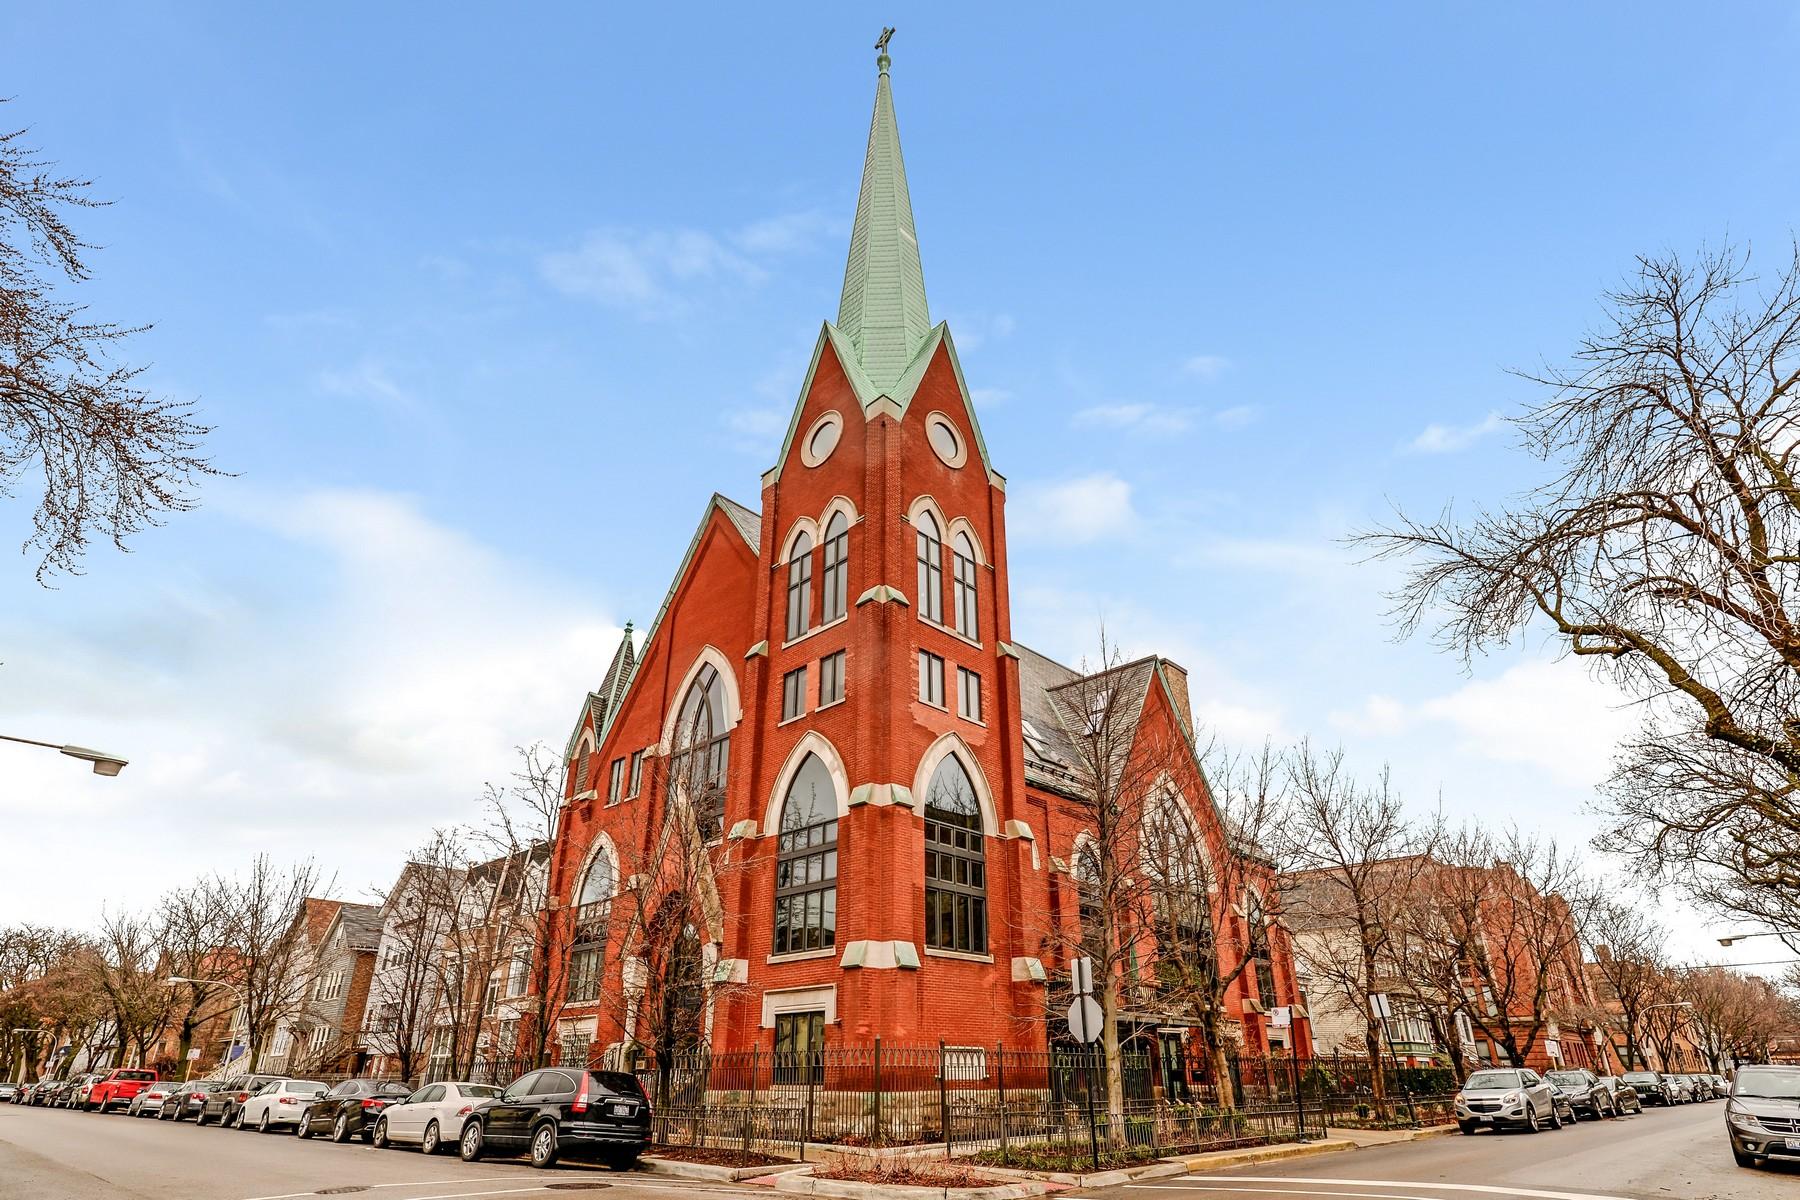 Condomínio para Venda às Unique Historic Cathedral Condo in Lakeview 3101 N Seminary Avenue Unit D Lakeview, Chicago, Illinois, 60657 Estados Unidos